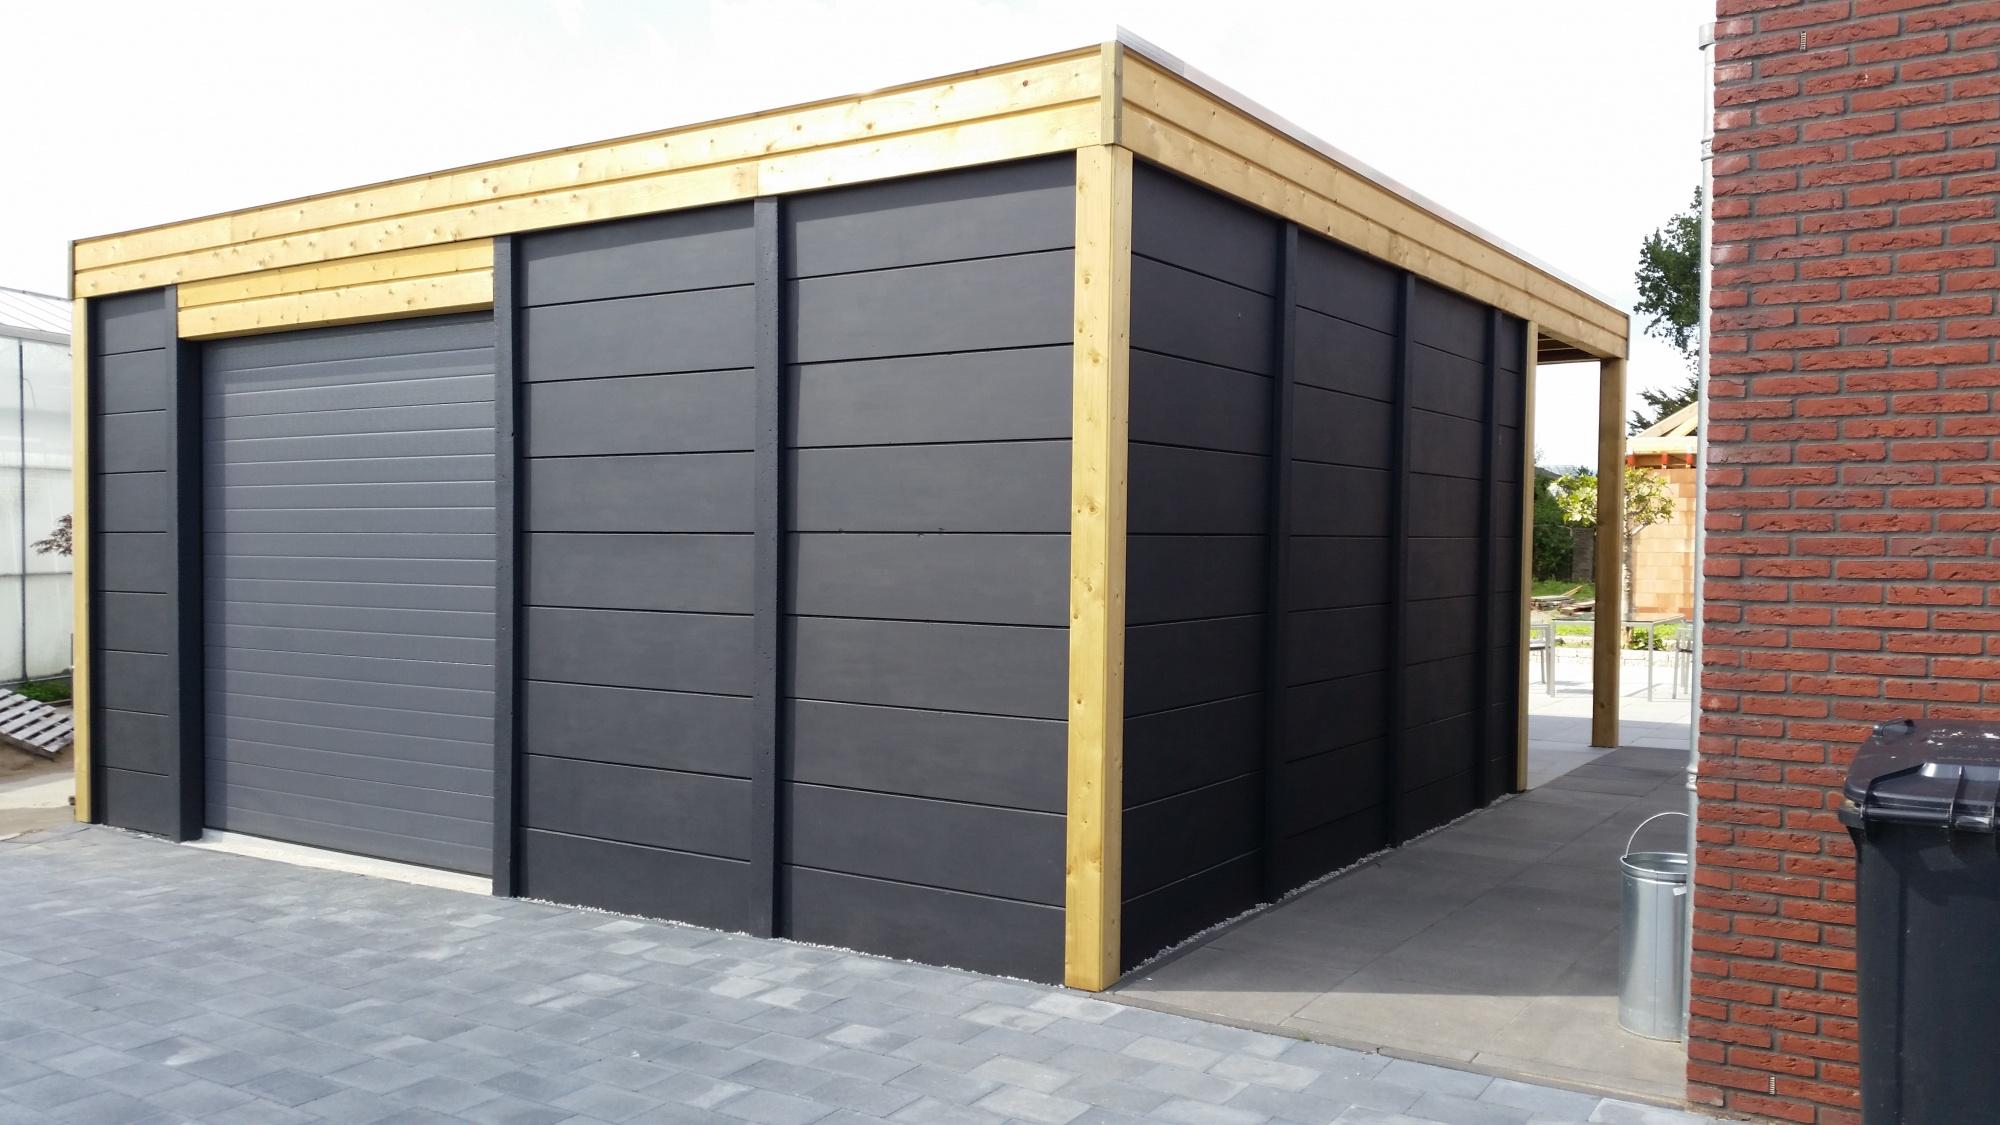 Prefab Schuur Steen : Garage in beton systeembouw steen motief structuur sbnbouw